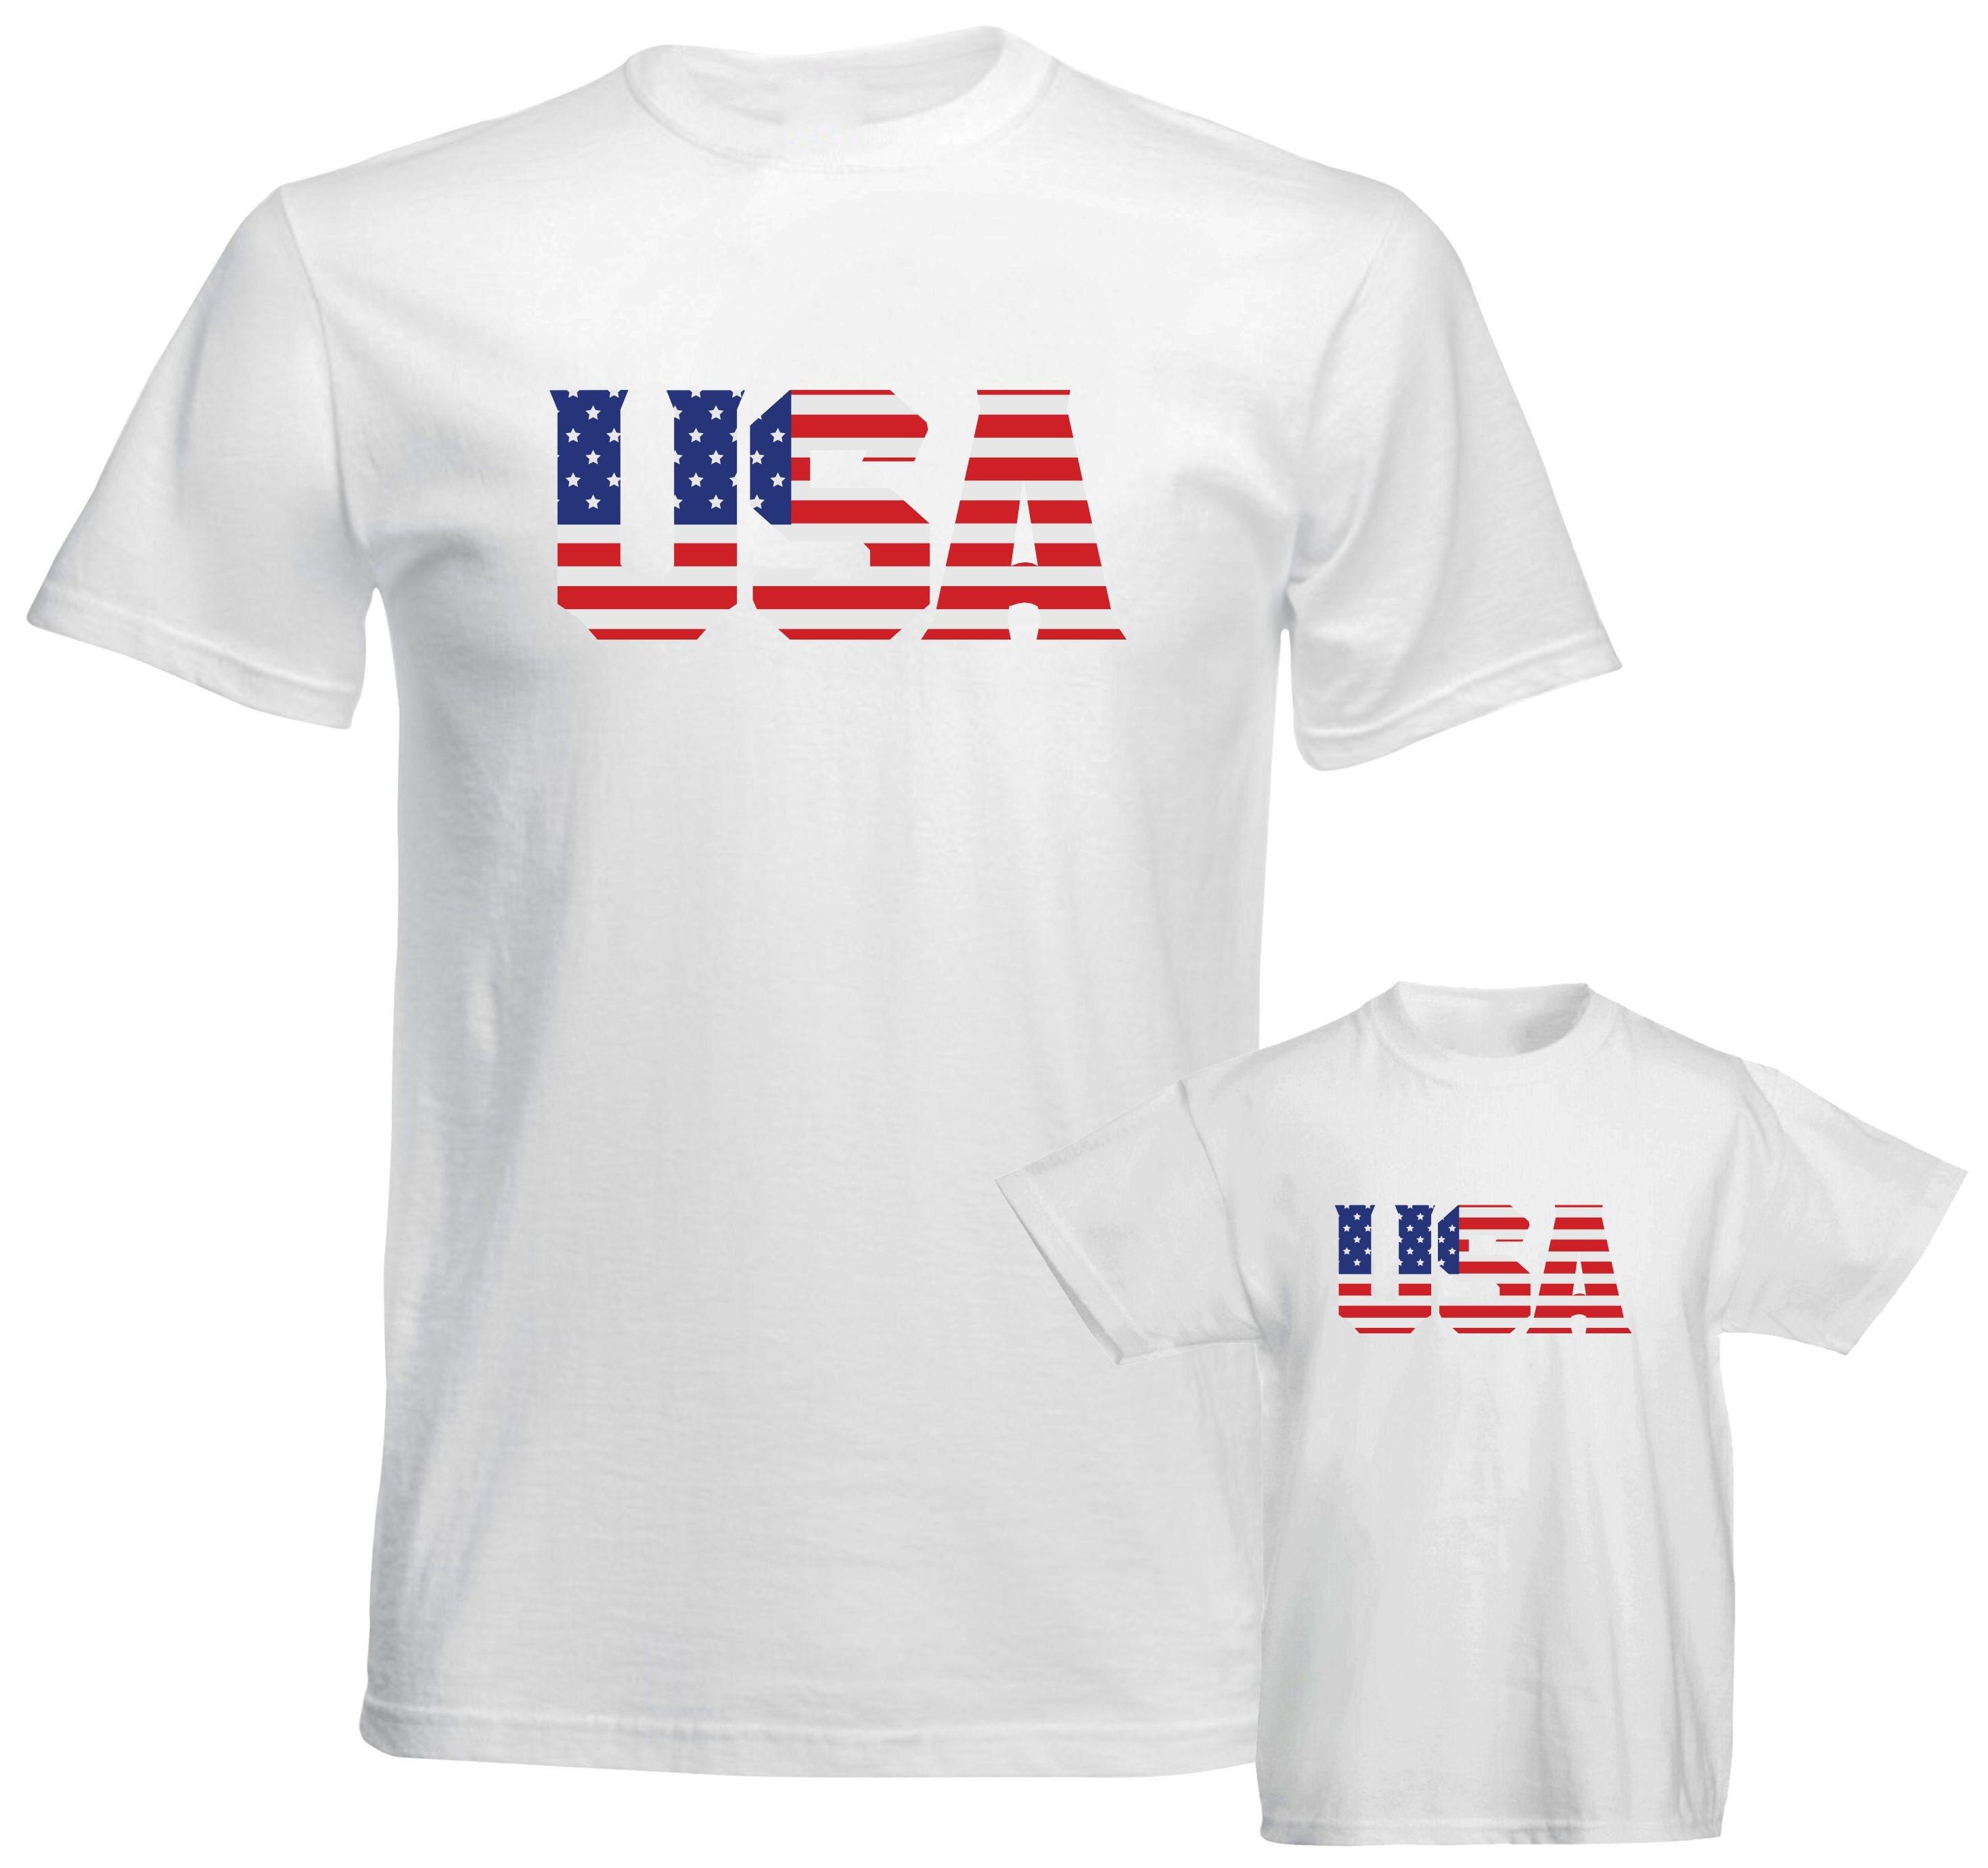 6236845256e America Shirt America 2018 World Cup Shirt FIFA World Cup 2018